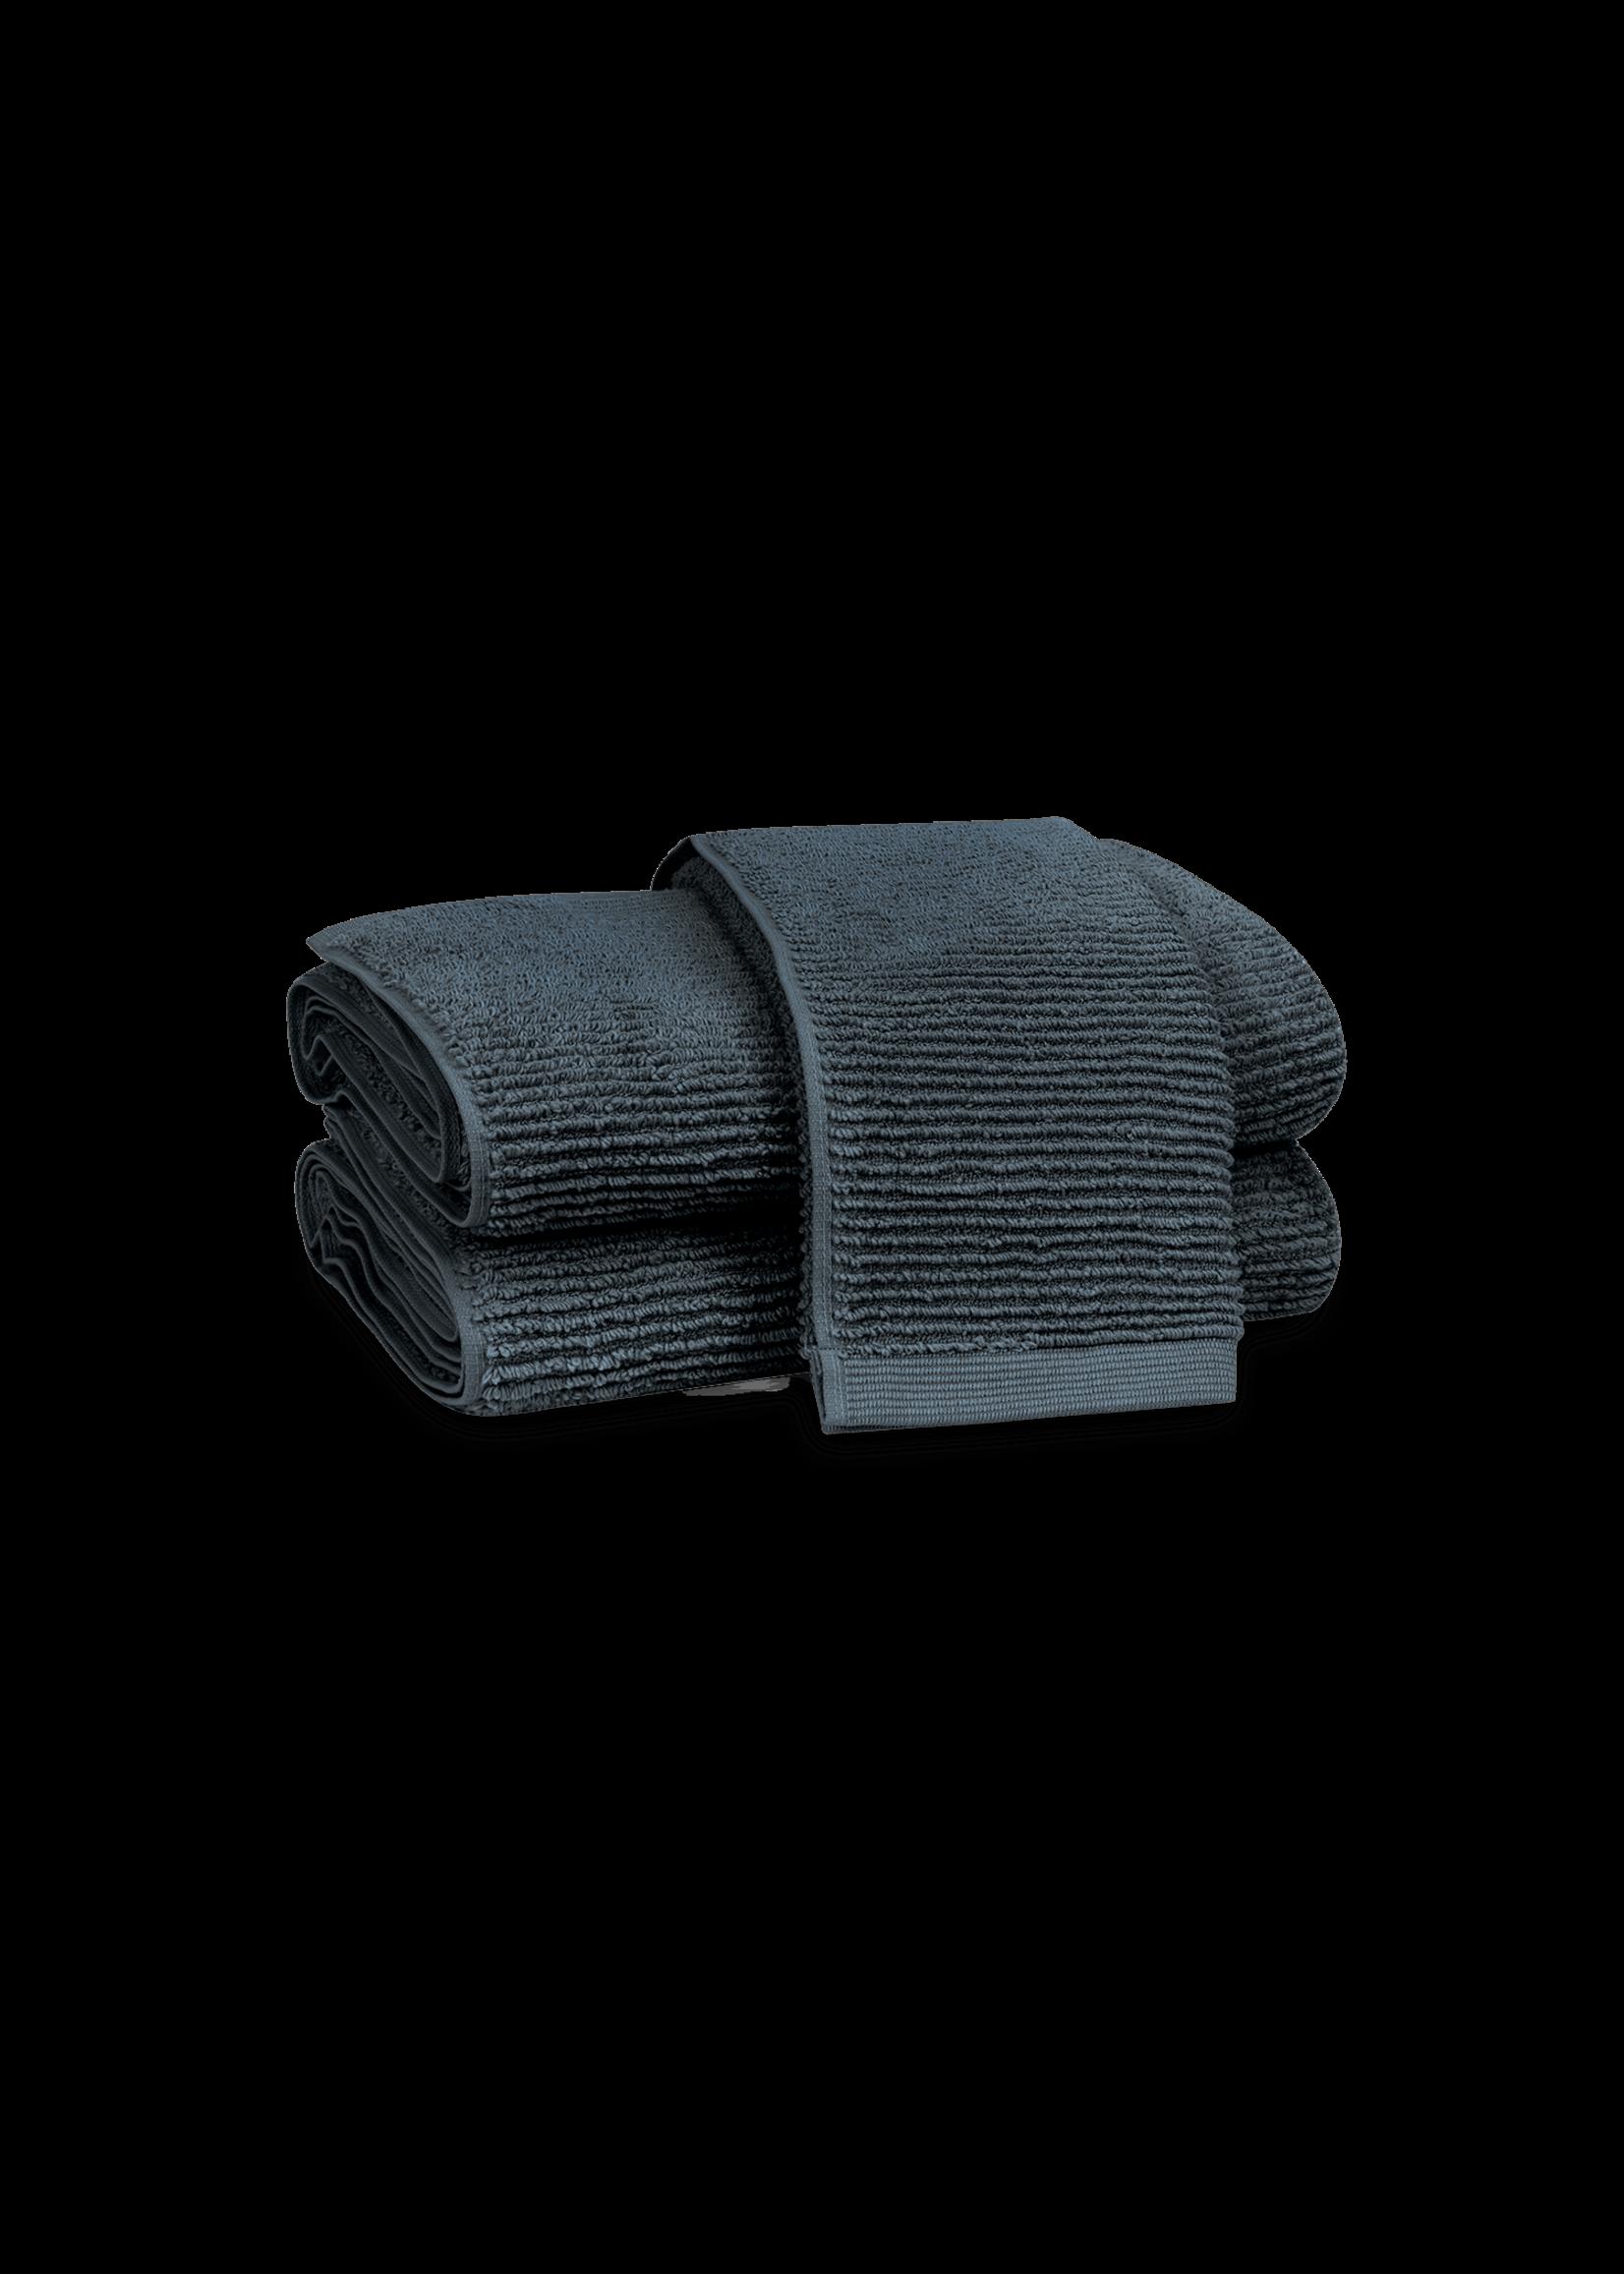 Matouk Aman Bath Towels